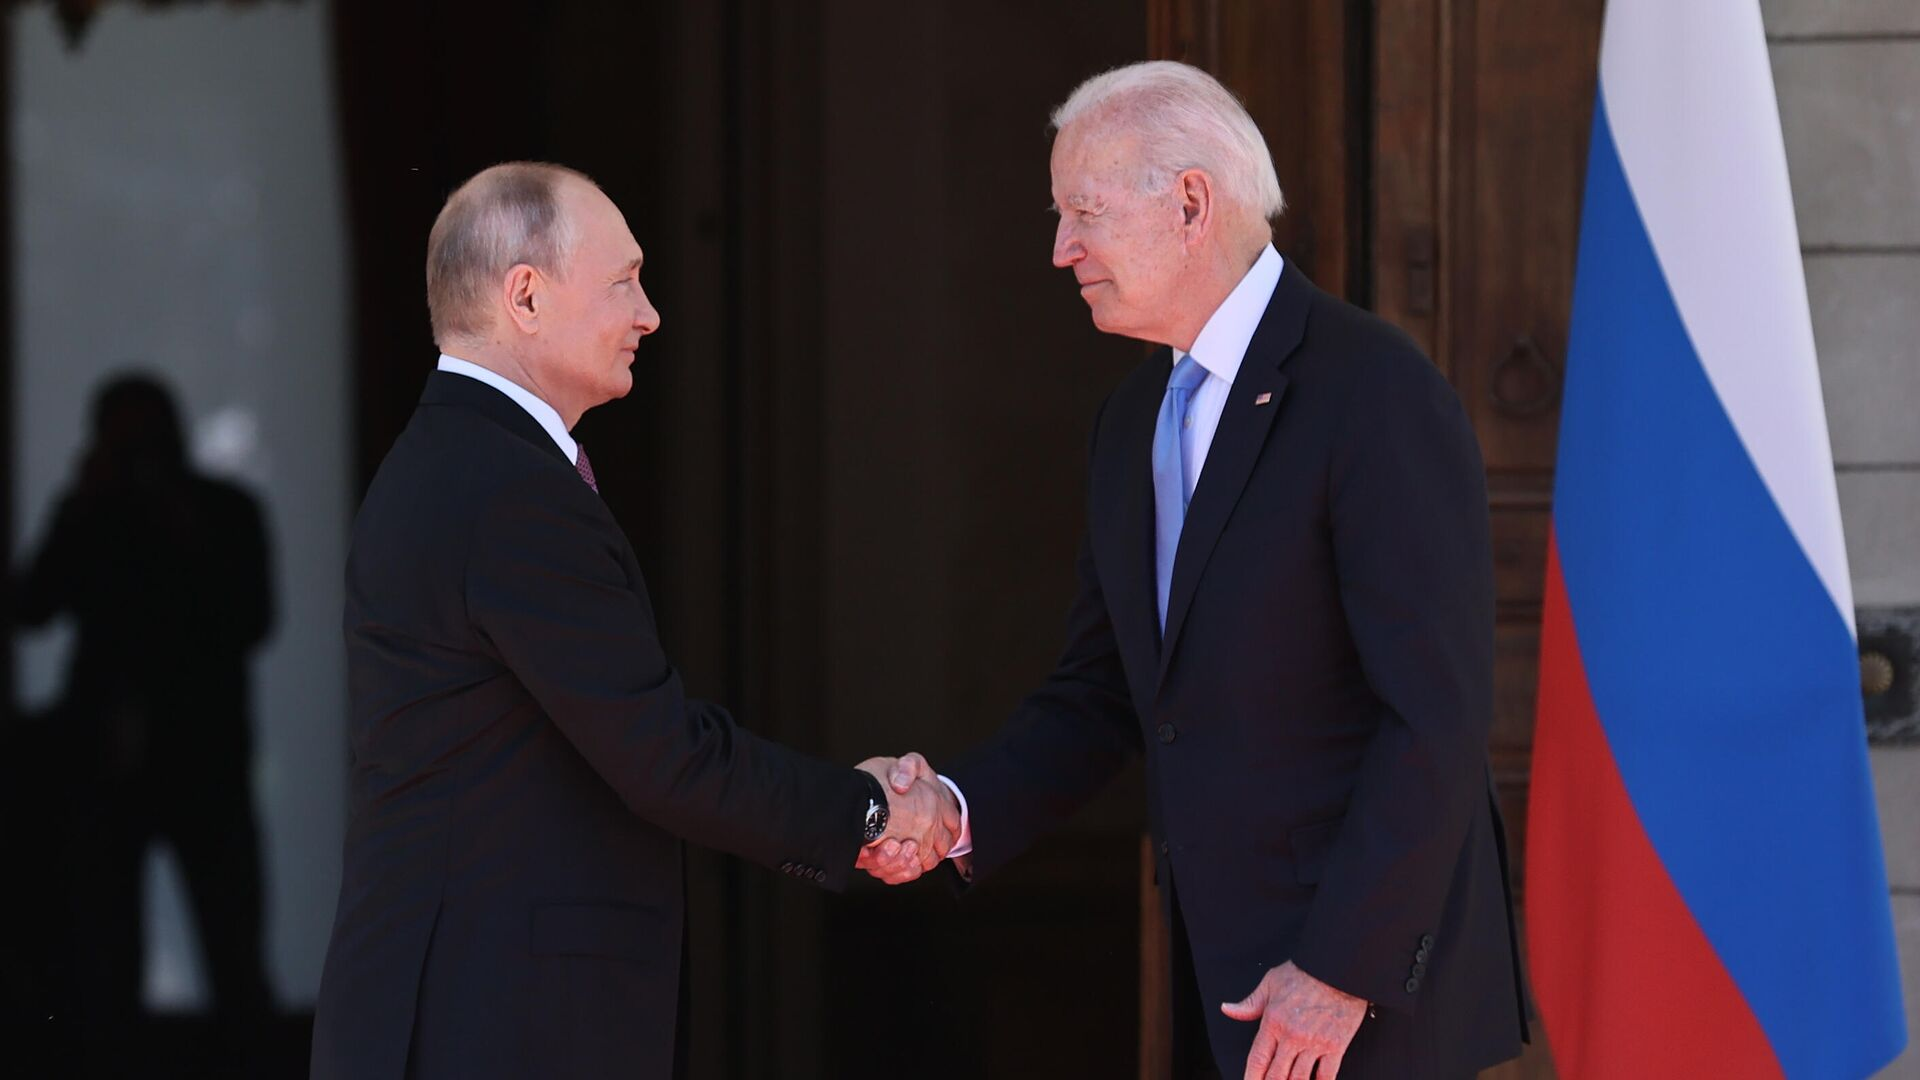 Президент РФ Владимир Путин и президент США Джо Байден во время встречи в Женеве на вилле Ла Гранж - РИА Новости, 1920, 18.09.2021